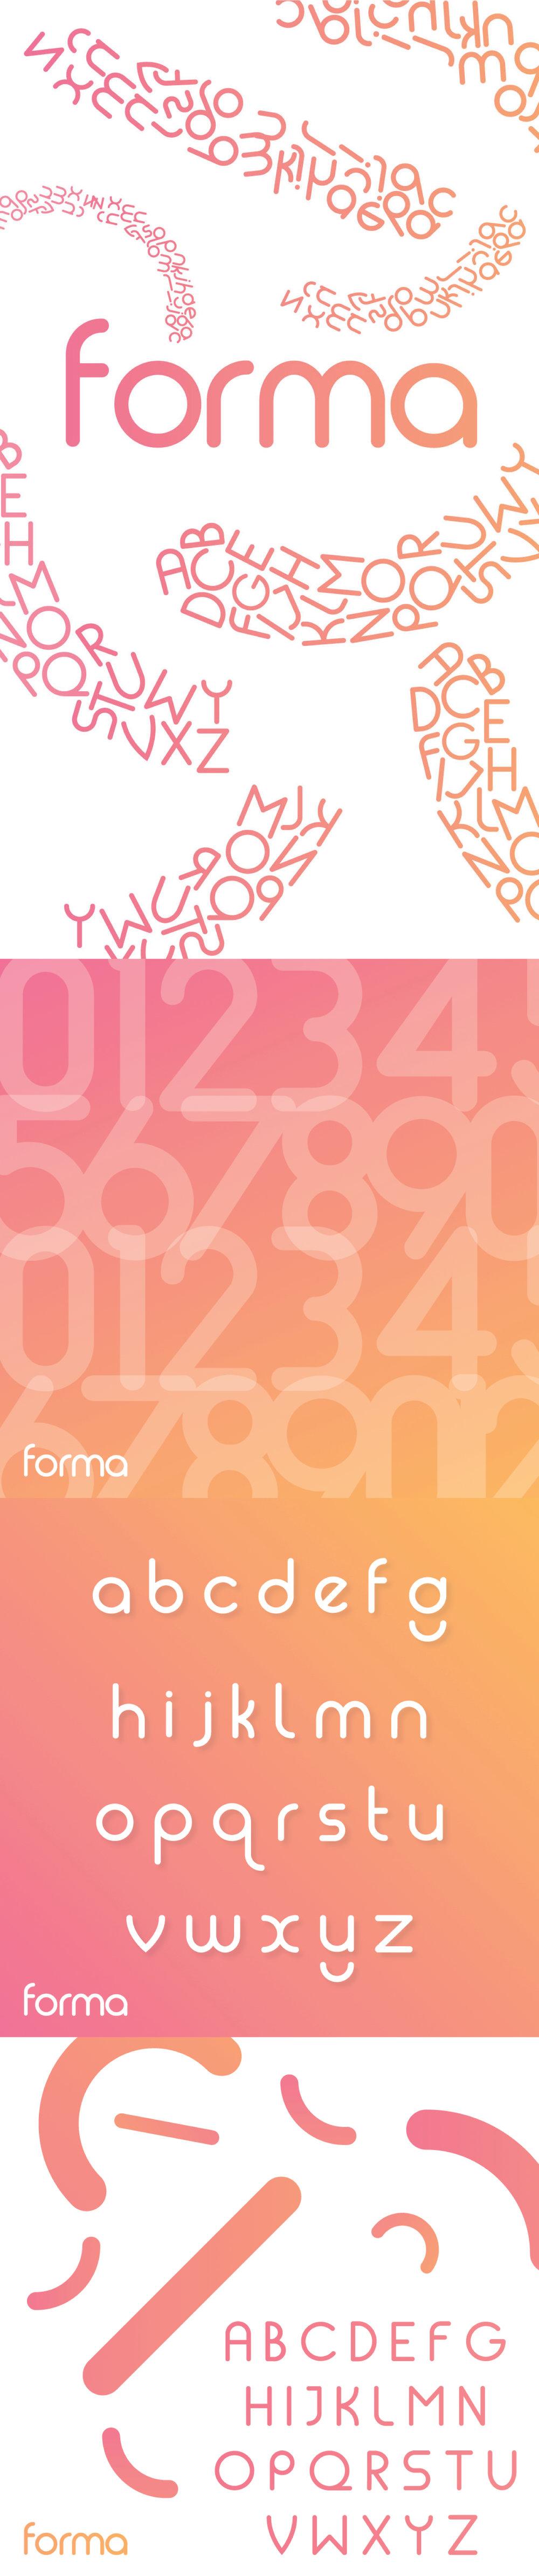 Forma-LONG.jpg